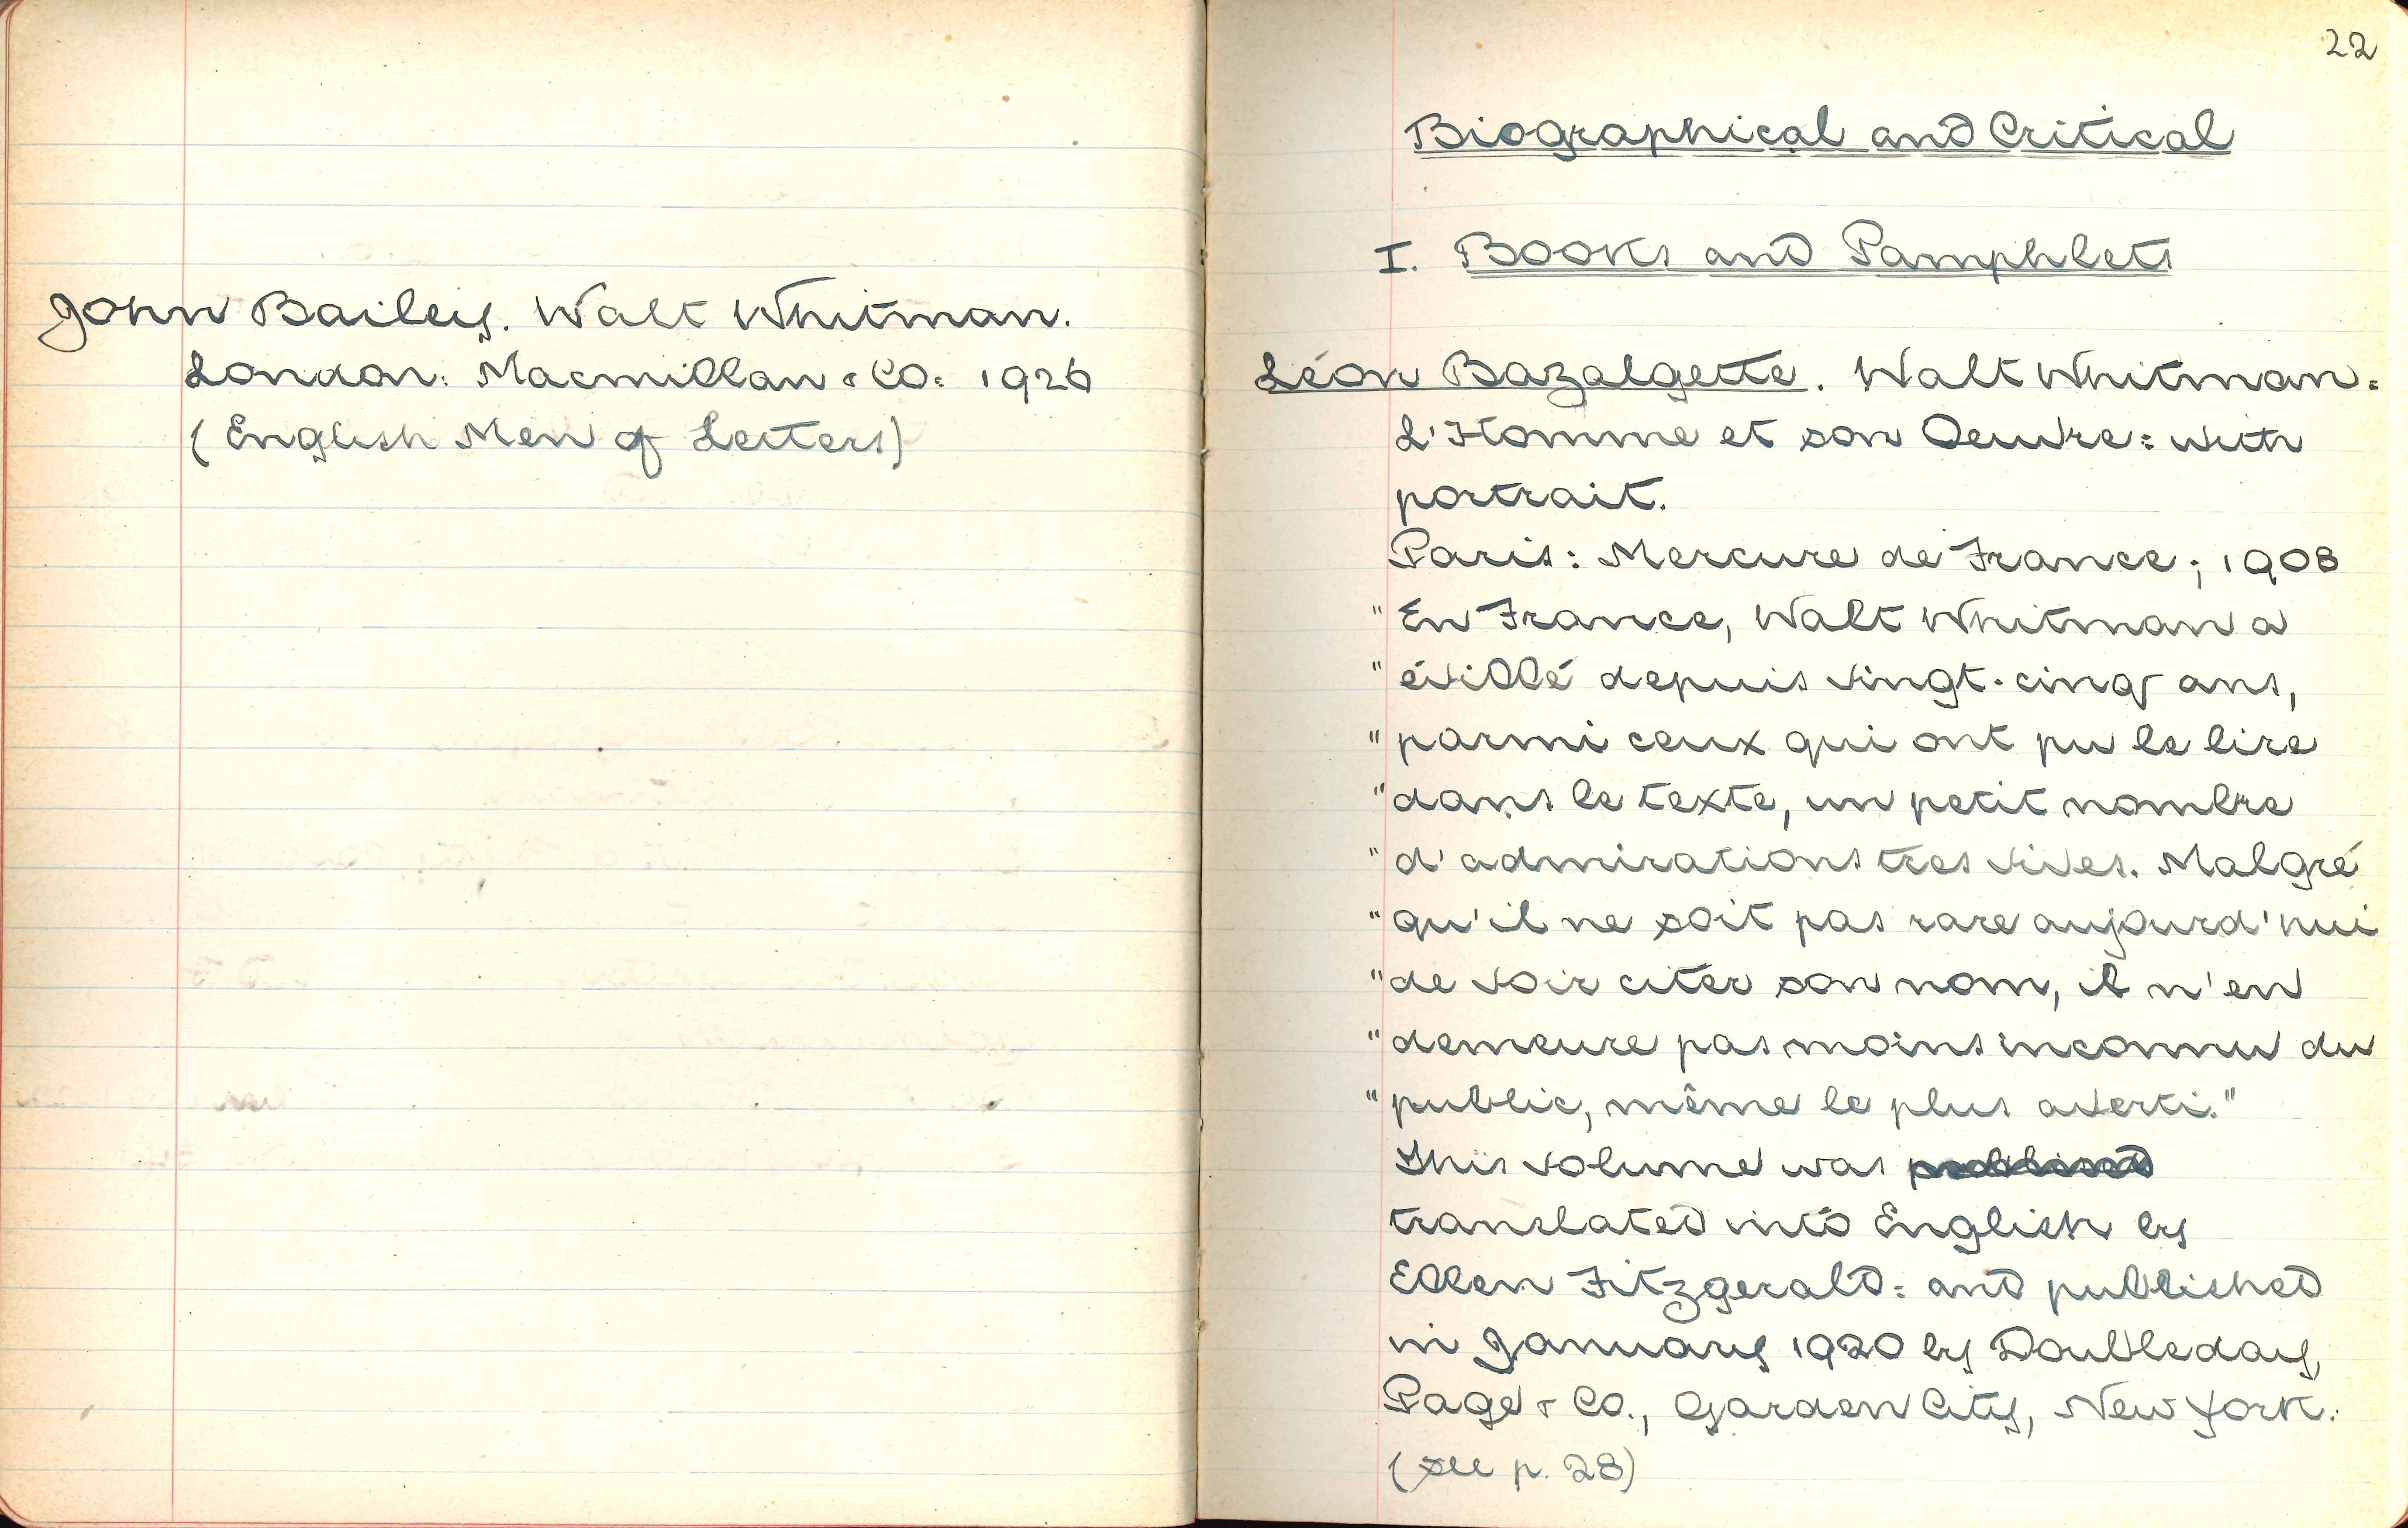 W.H. Trimble. Catalogue of a Collection of Walt Whitman Literature. Manuscript. [St Leonards, Otago, 1924]